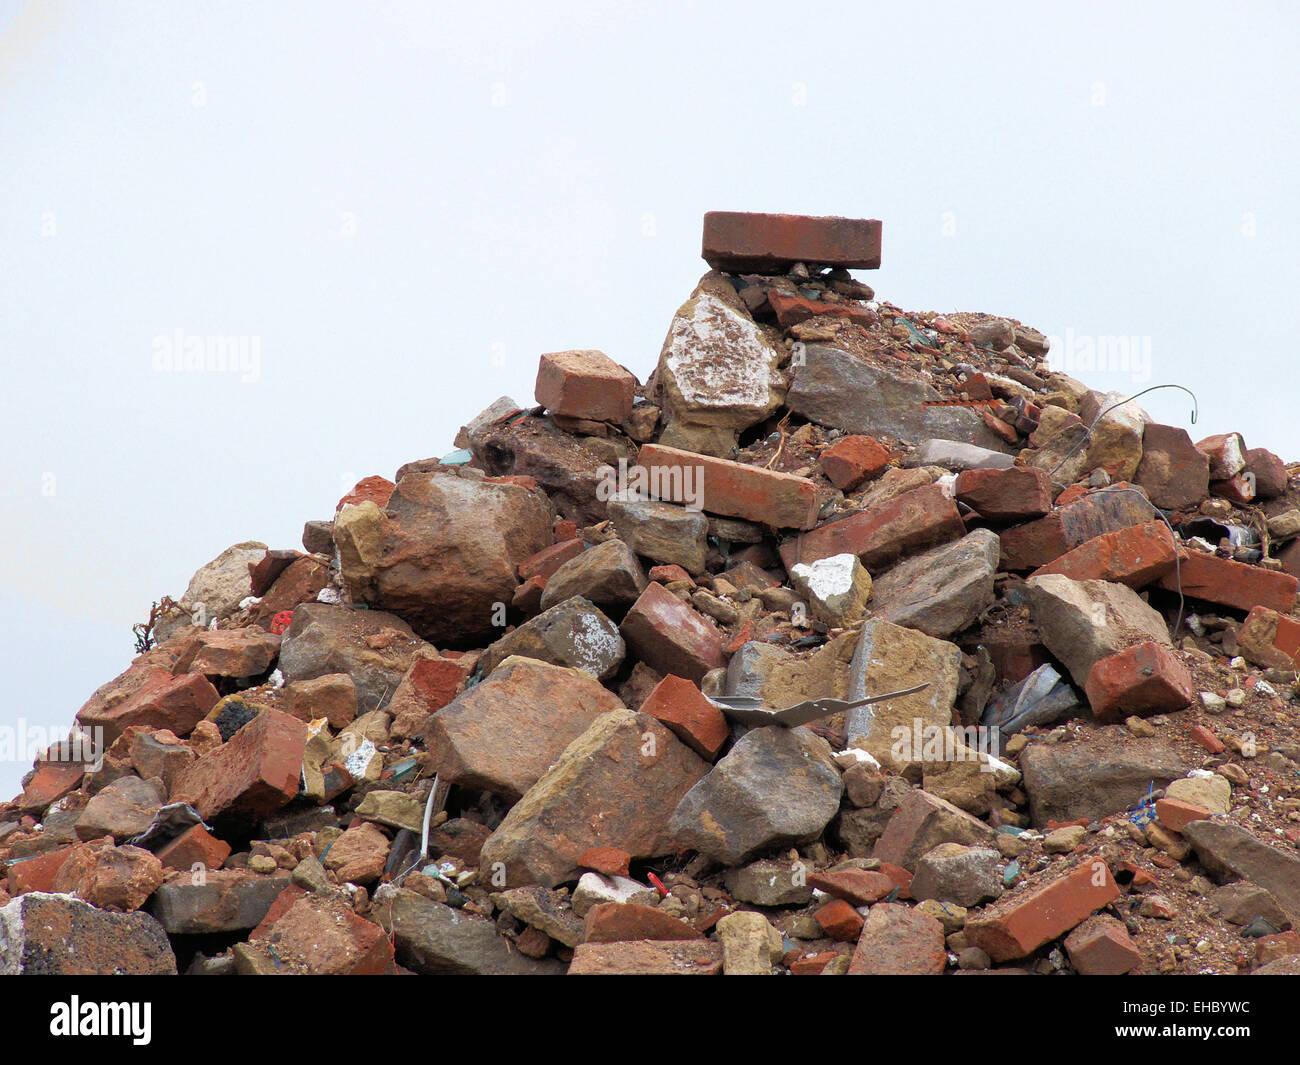 Dumping - Stock Image